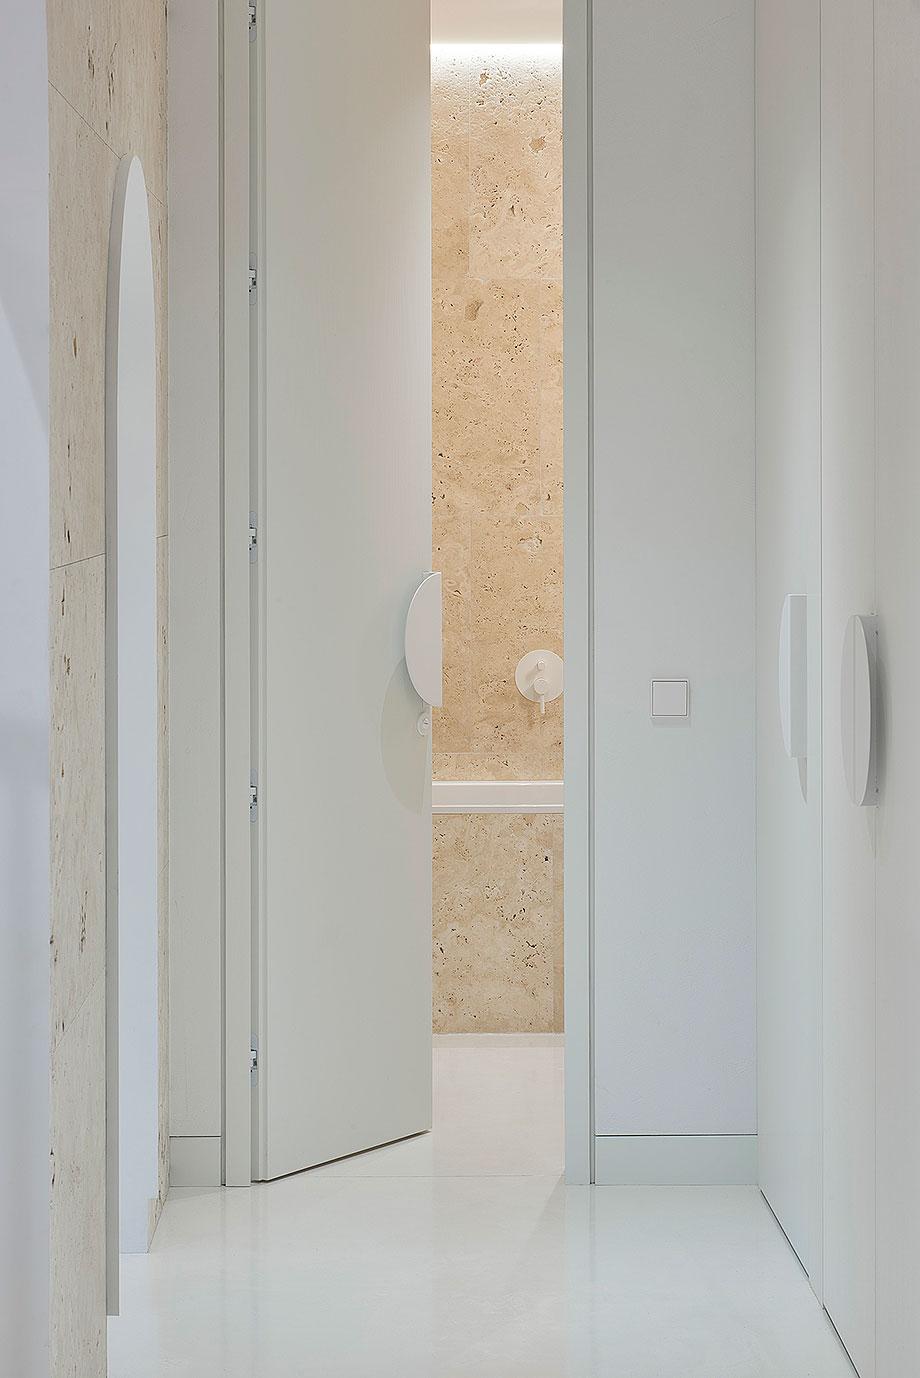 apartamento con un muro de piedra revestido con travertino por 2xj architects (5) - foto darius petrulaitis